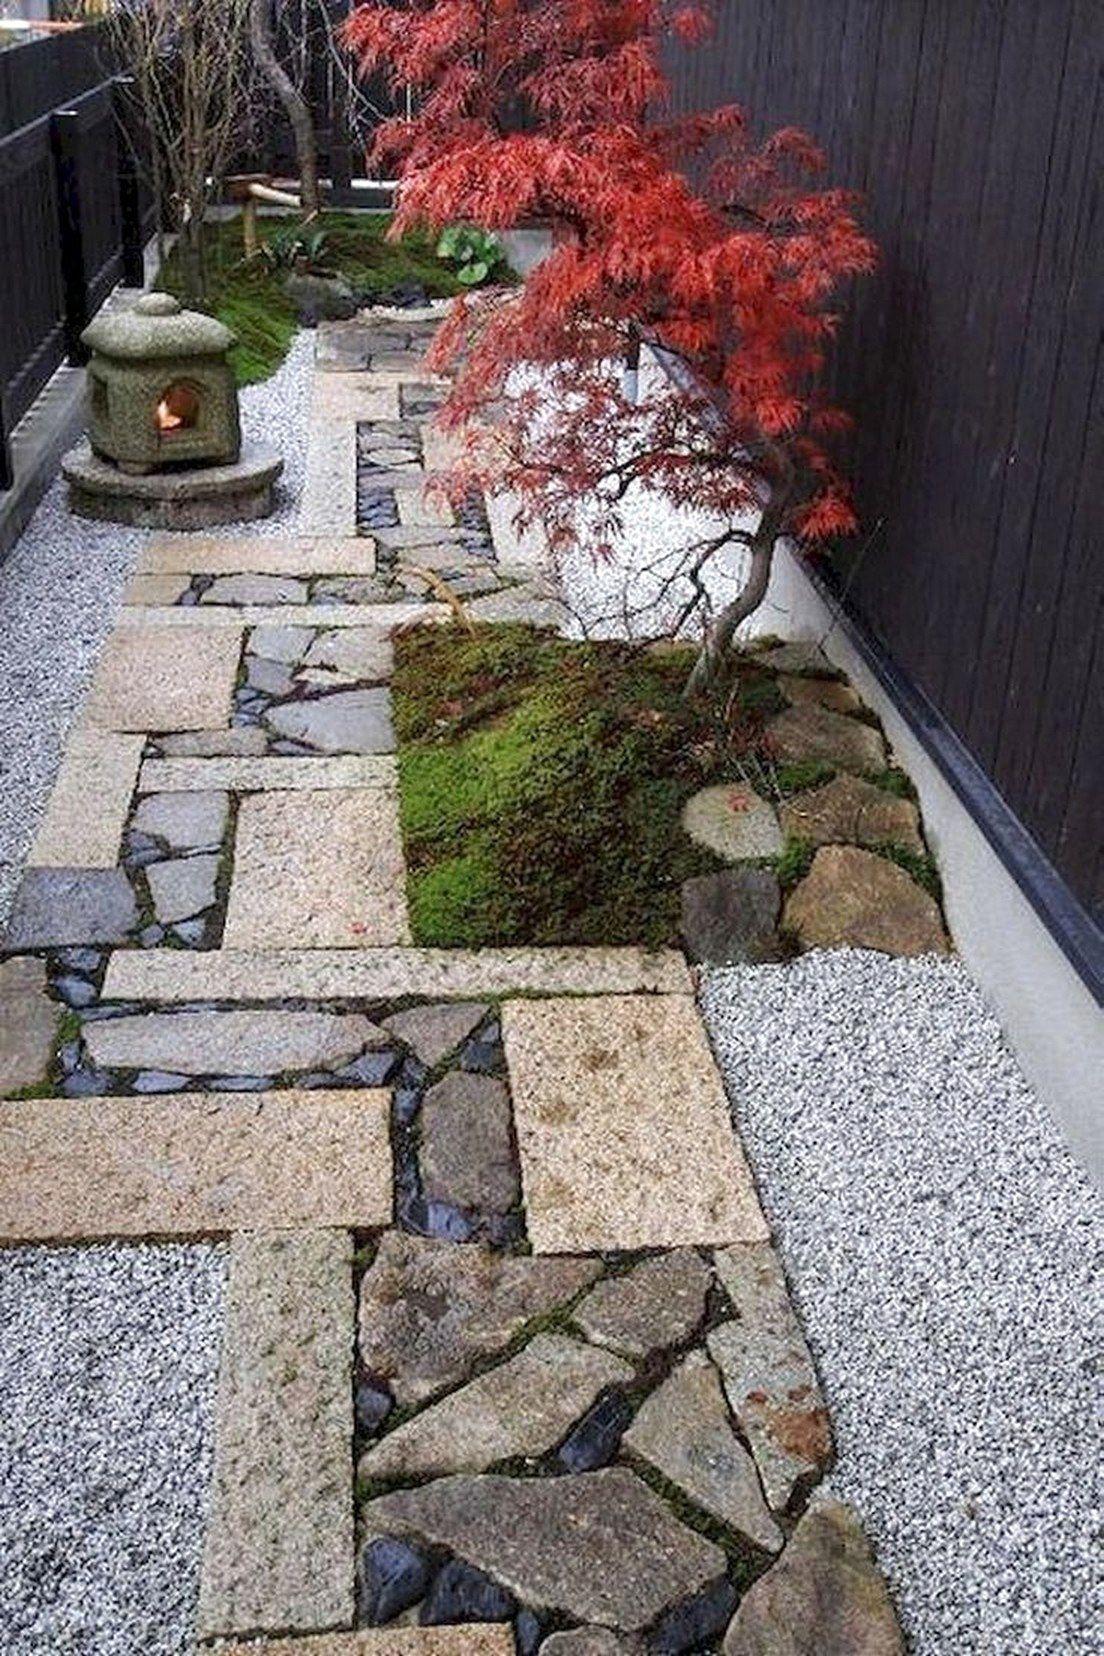 170 Landscape Ideas Landscape Design Landscape Garden Design